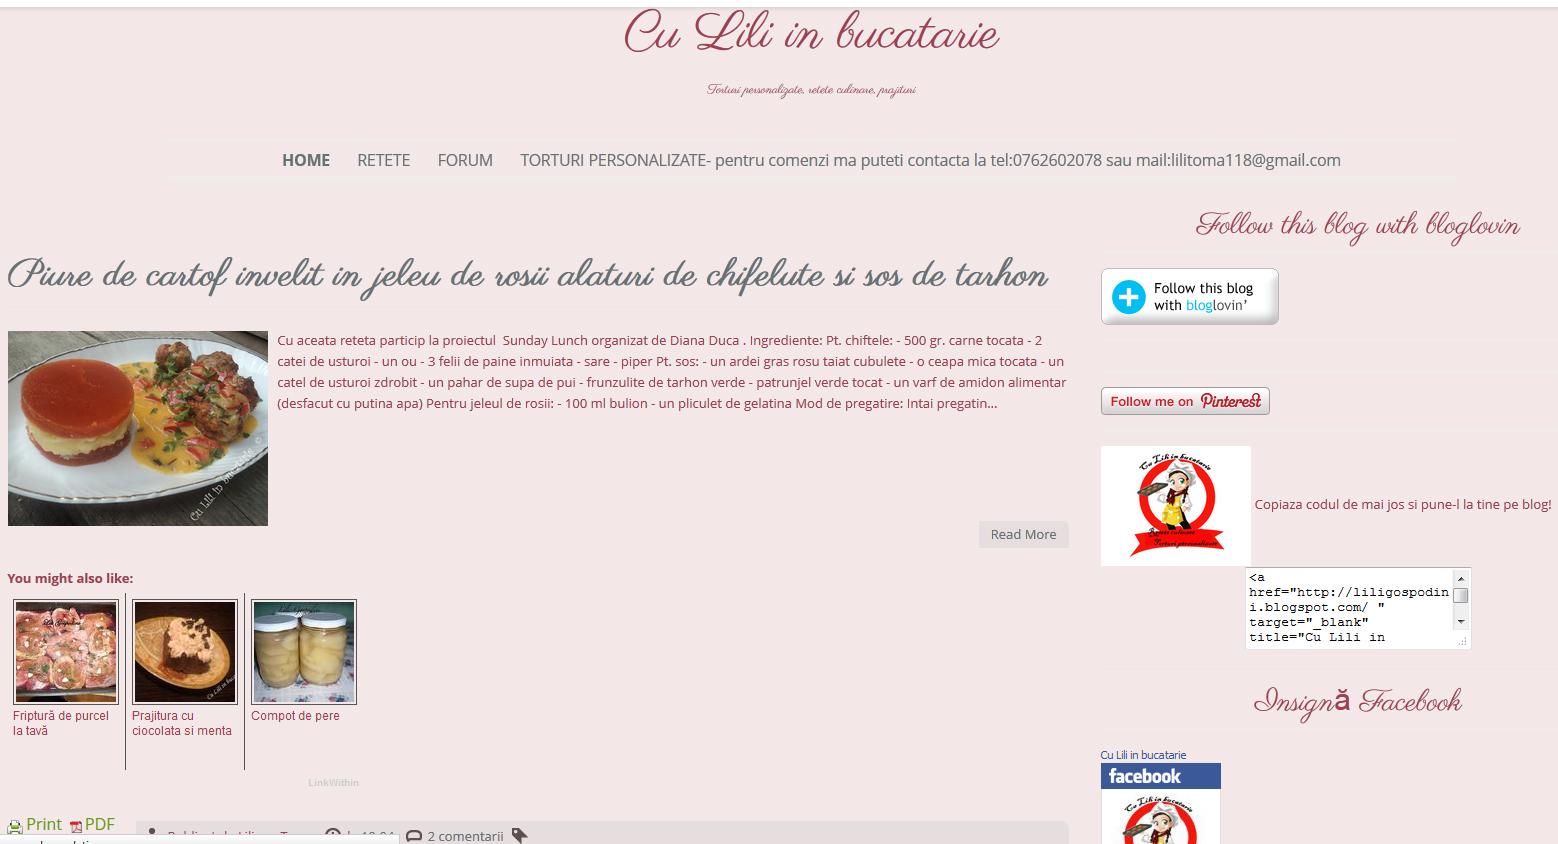 http://liligospodini.blogspot.ro/